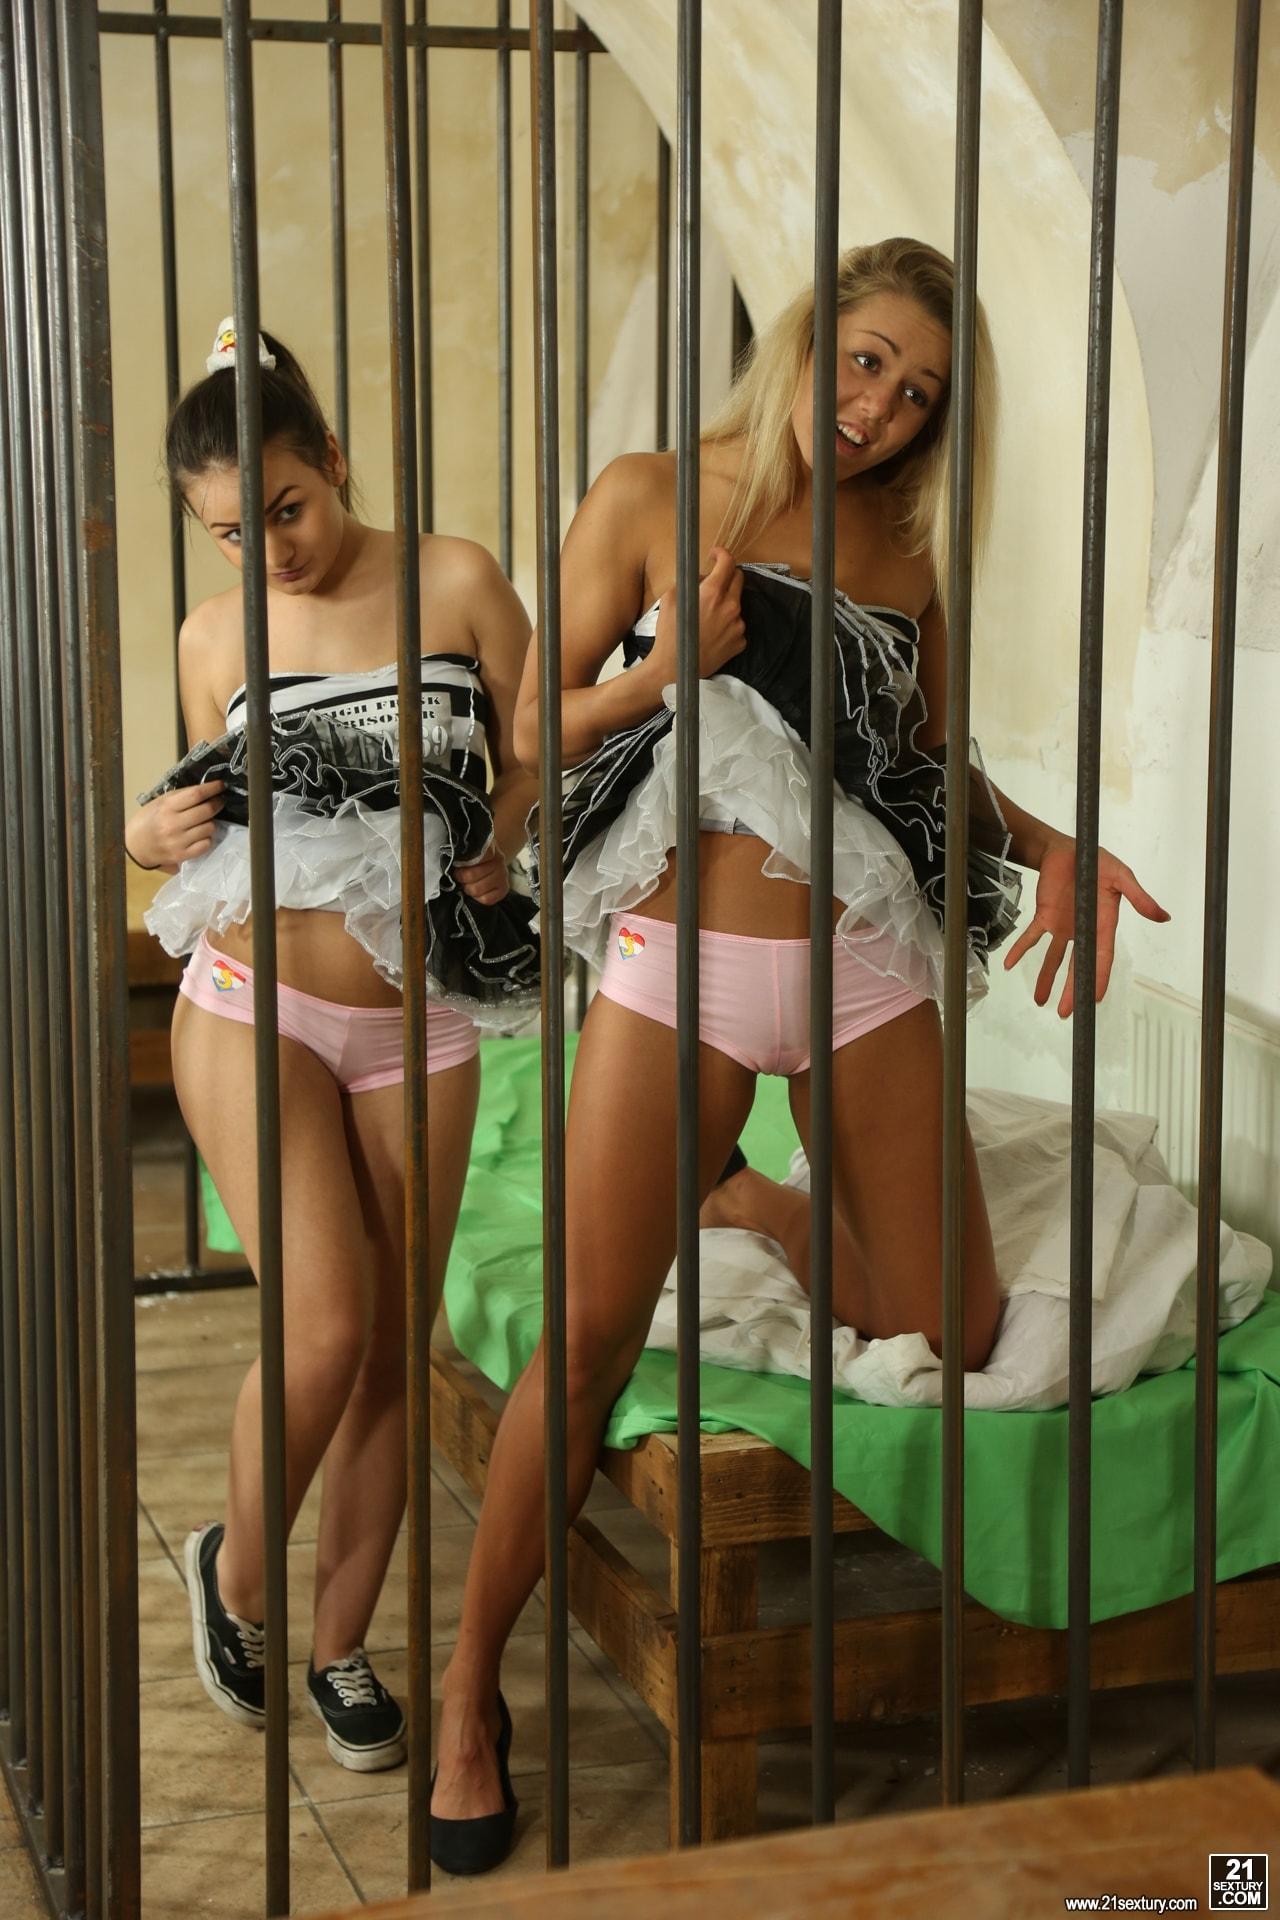 21Sextury 'High Frisk Prisoners' starring Christen Courtney (Photo 2)